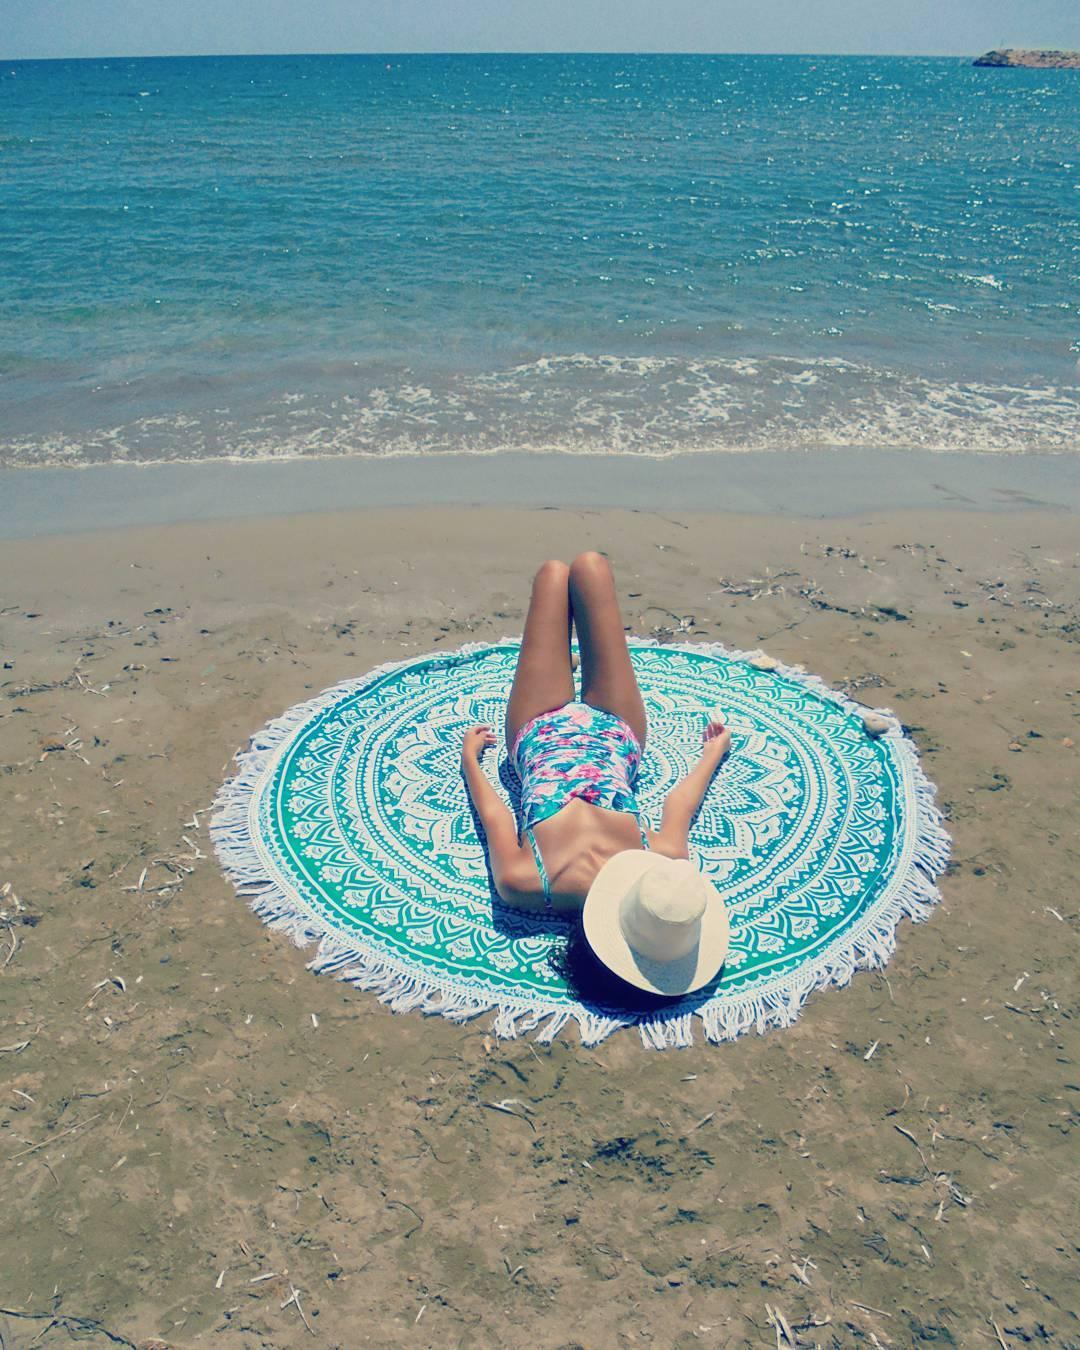 The obligatory #summer2017 mandala round beach throw instagram photo 🌴😄🐚🐬🌴